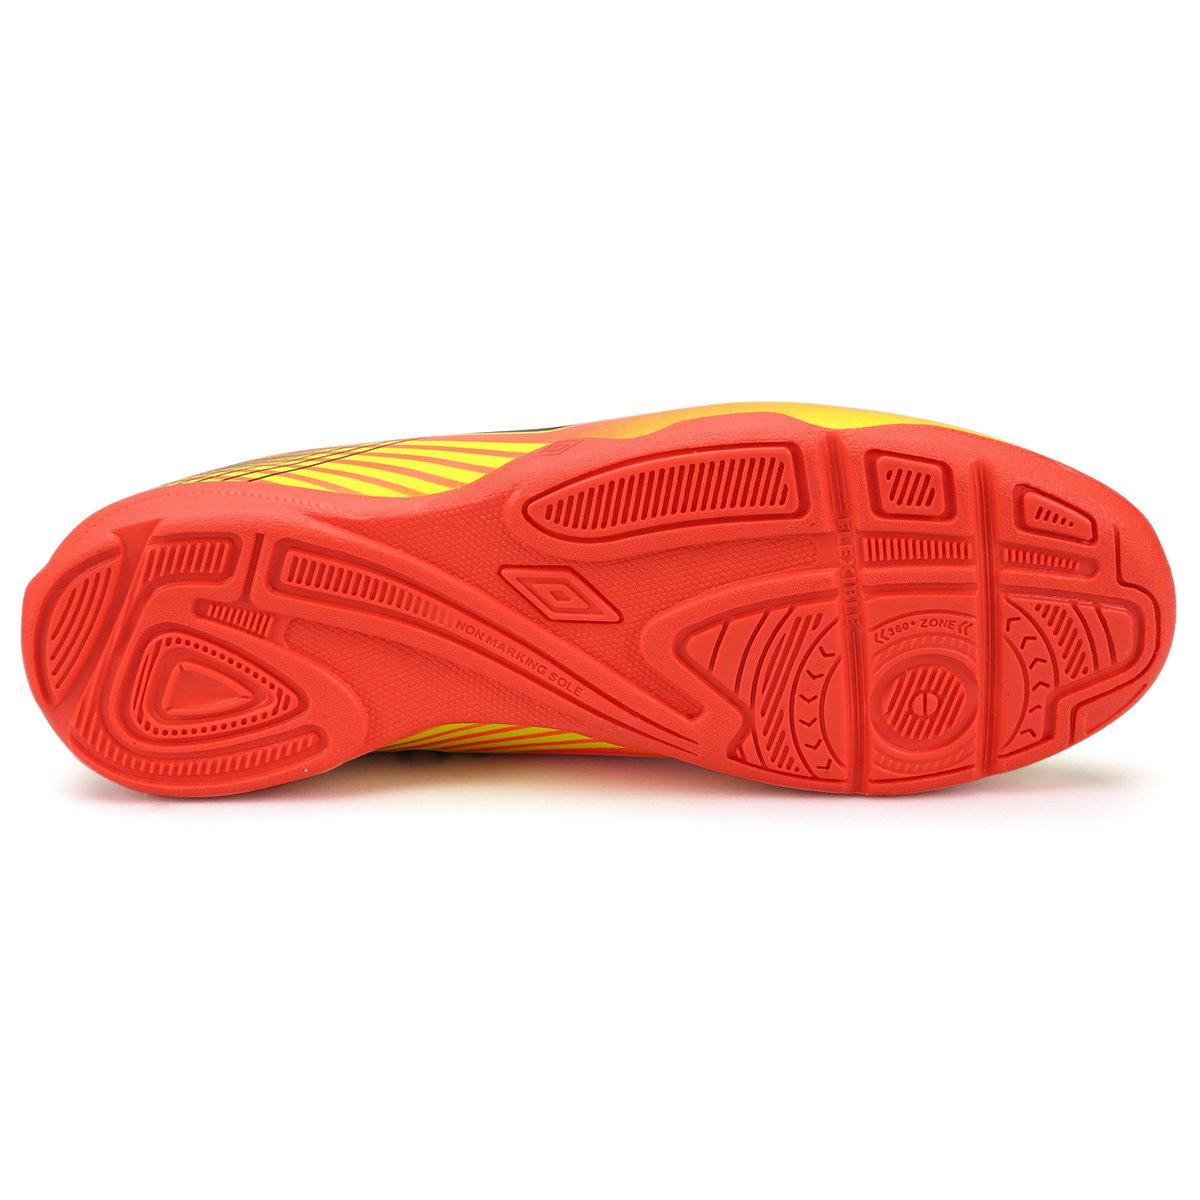 Chuteira Futsal Umbro Slice 3 Masculina - Laranja e Verde - Compre ... 30920c02feb0c